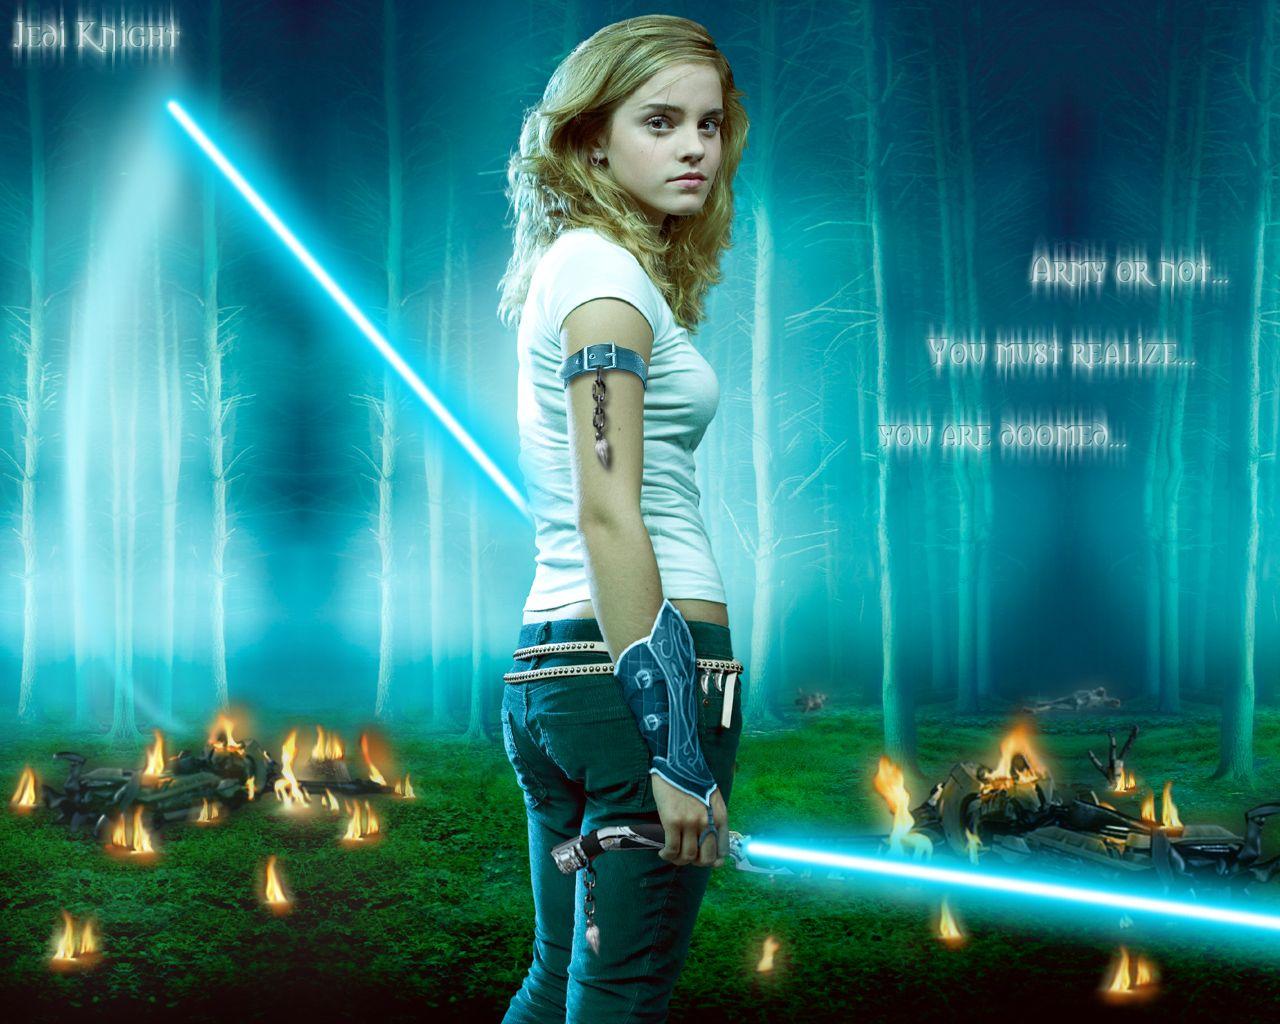 Emma Watson Jedi Knight By Rhanubis On Deviantart Emma Watson Jedi Knight Emma Watson Wallpaper